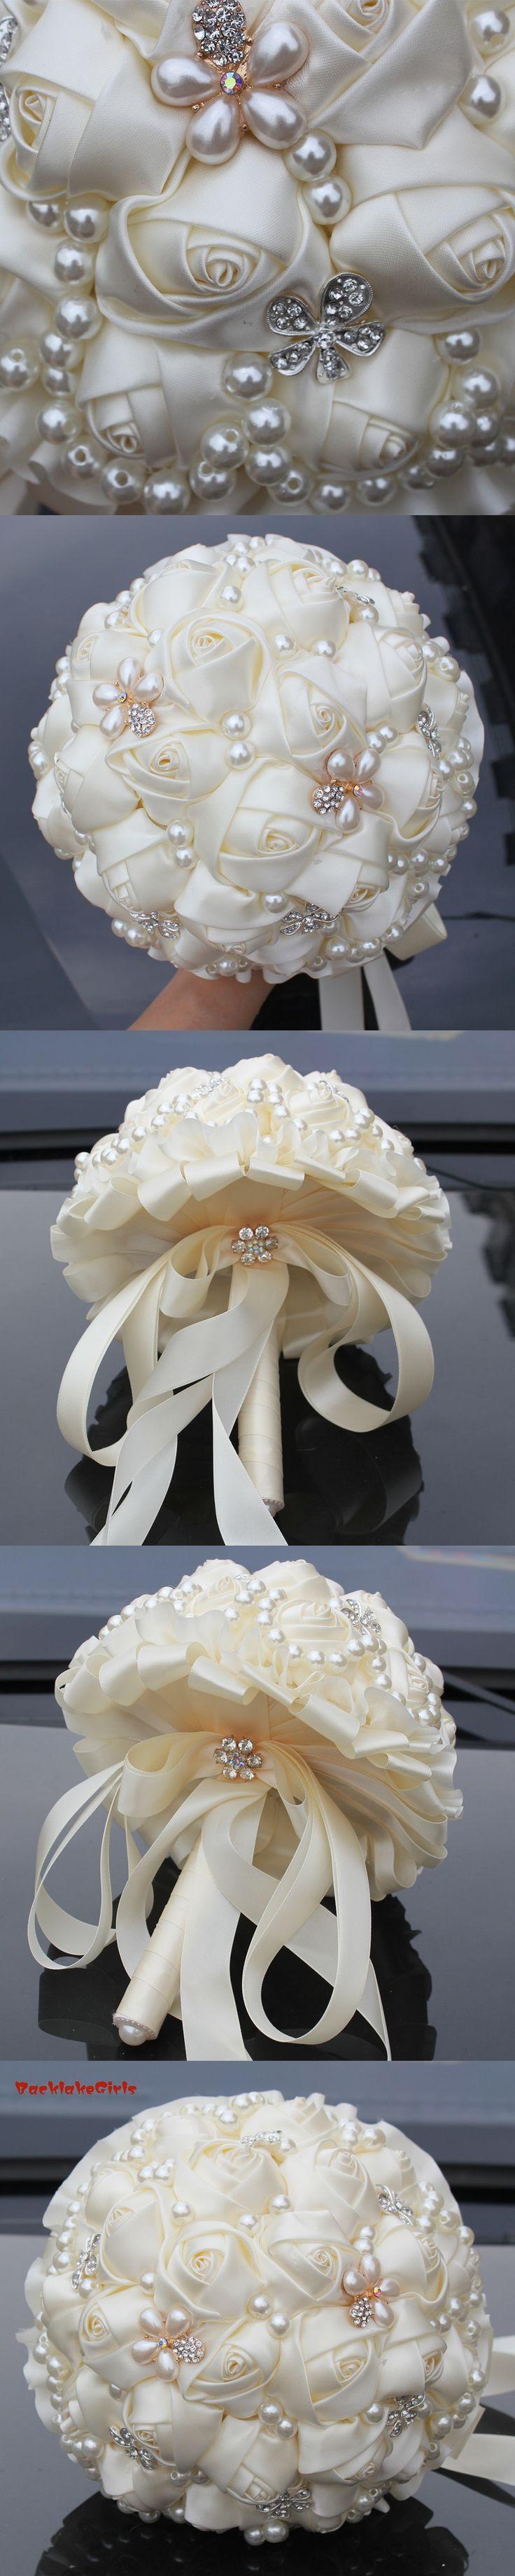 New Arrival Best Price Color Bridal Bouquet Artificial Wedding Bouquets Brooch Bouquet Wedding ramos de novia artificial